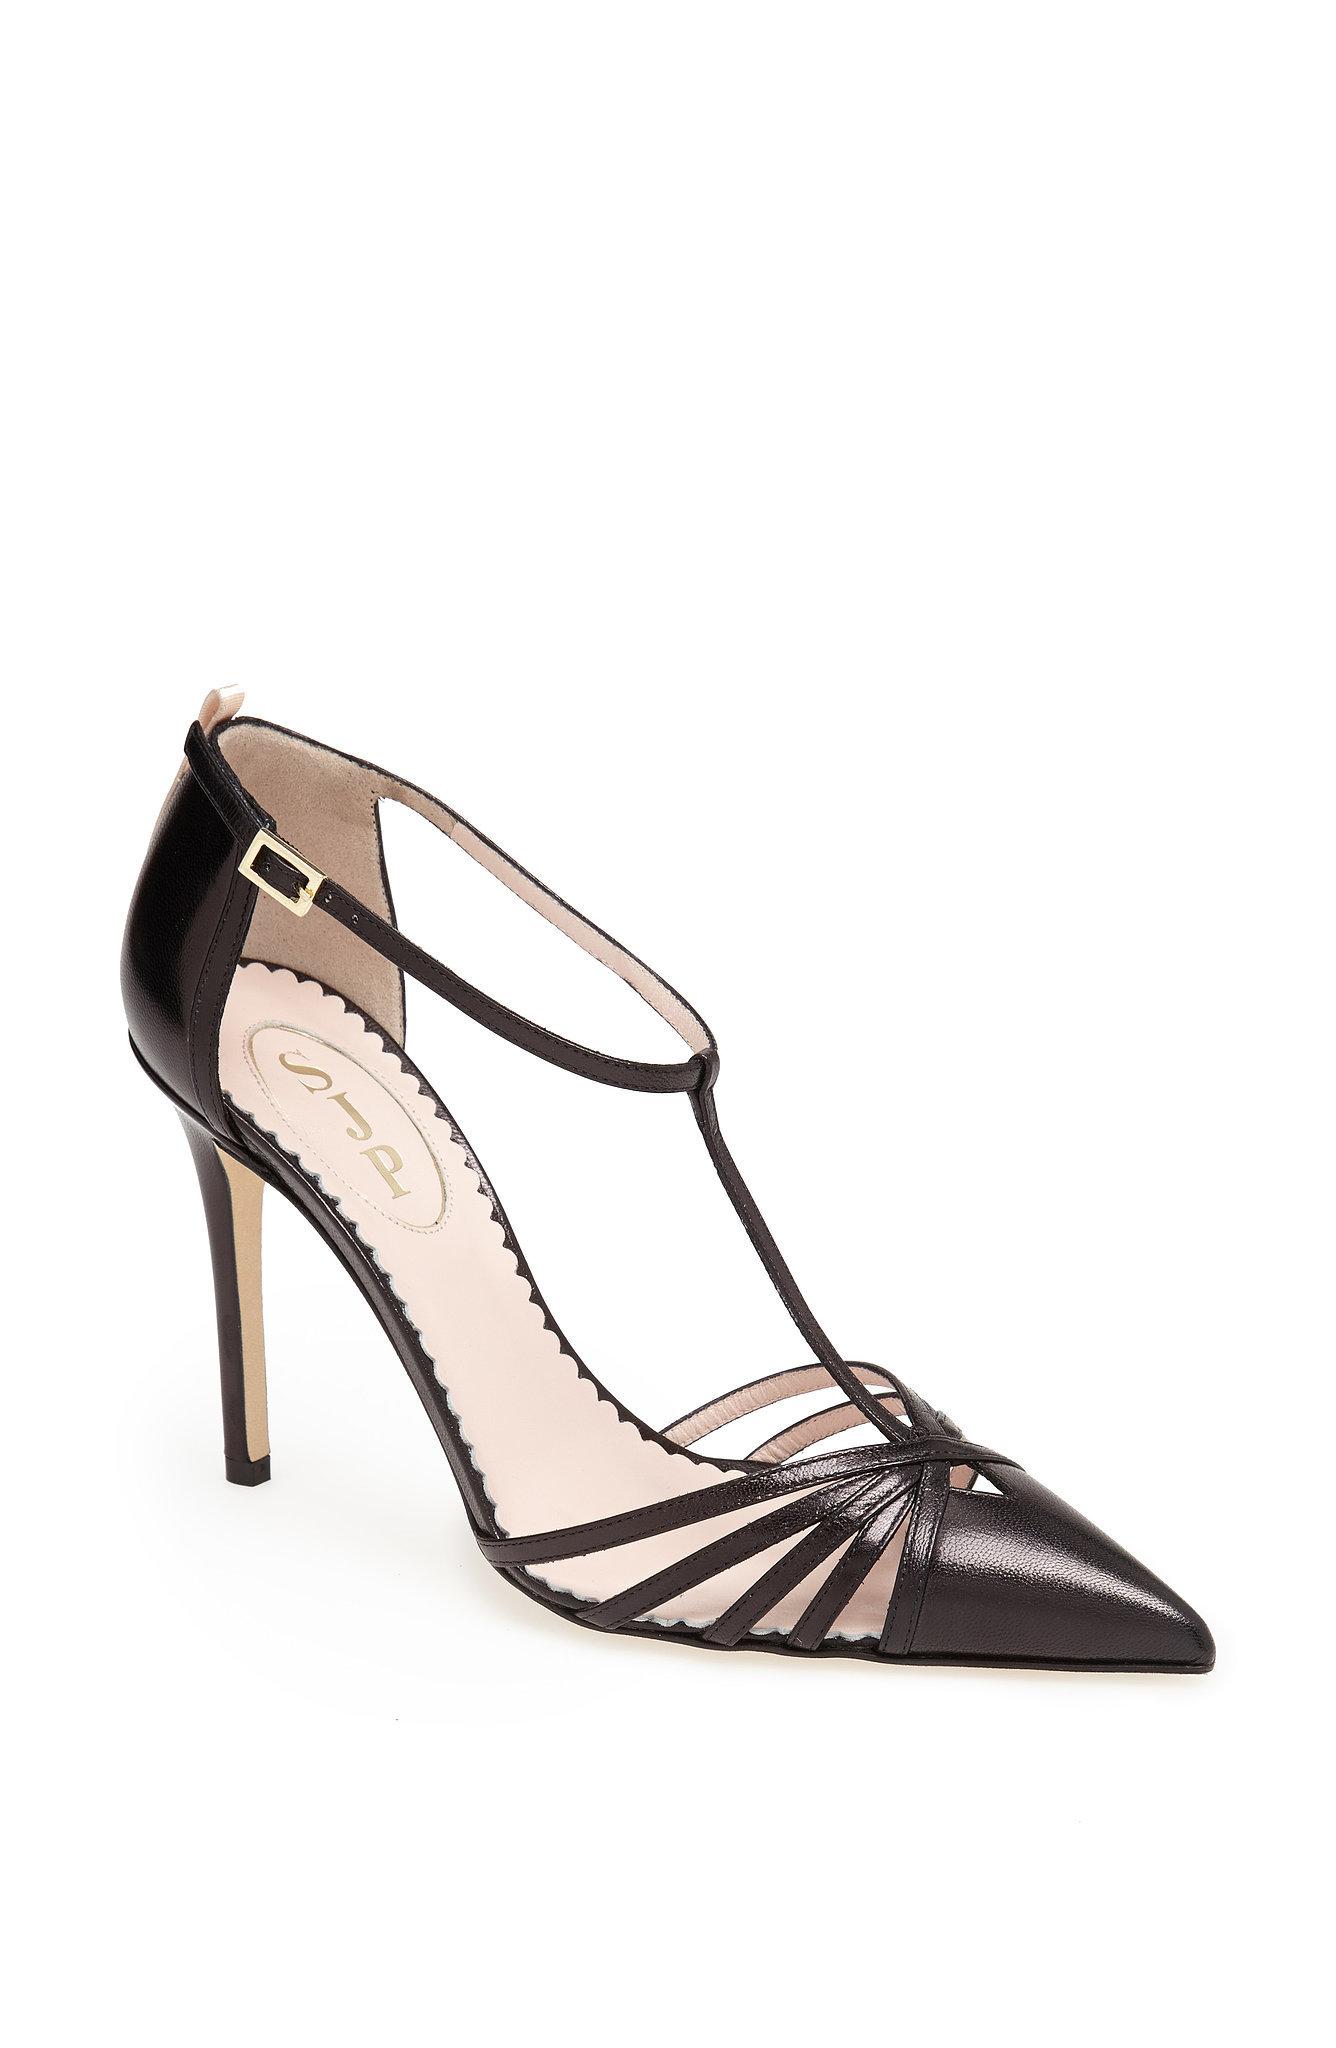 Carrie in Black, $355